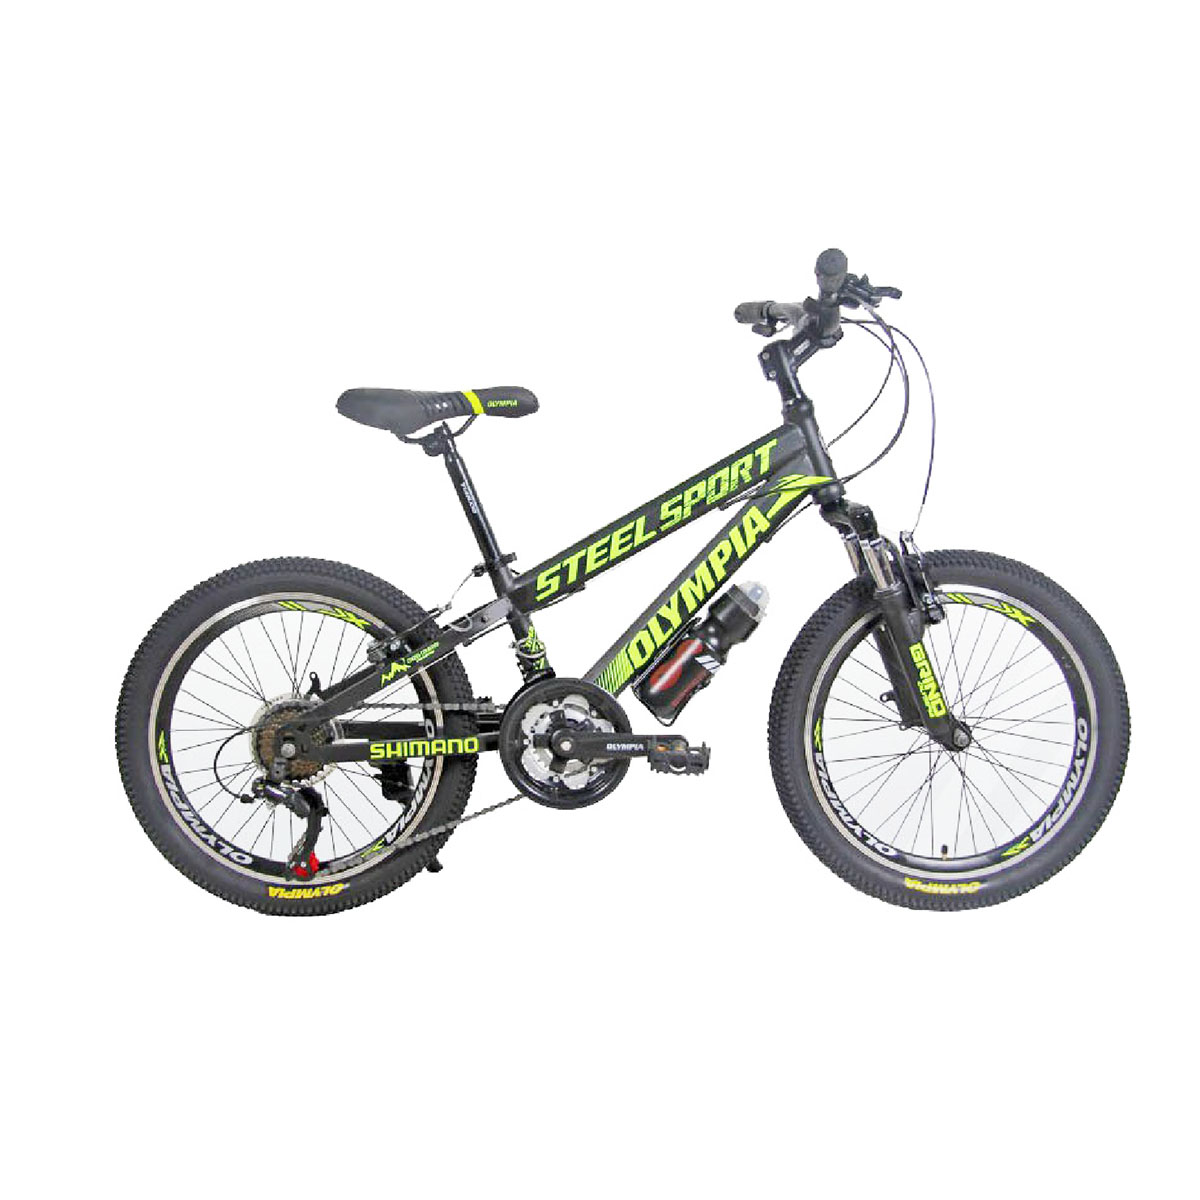 دوچرخه کوهستان المپیا مدل 20123Y سایز 20